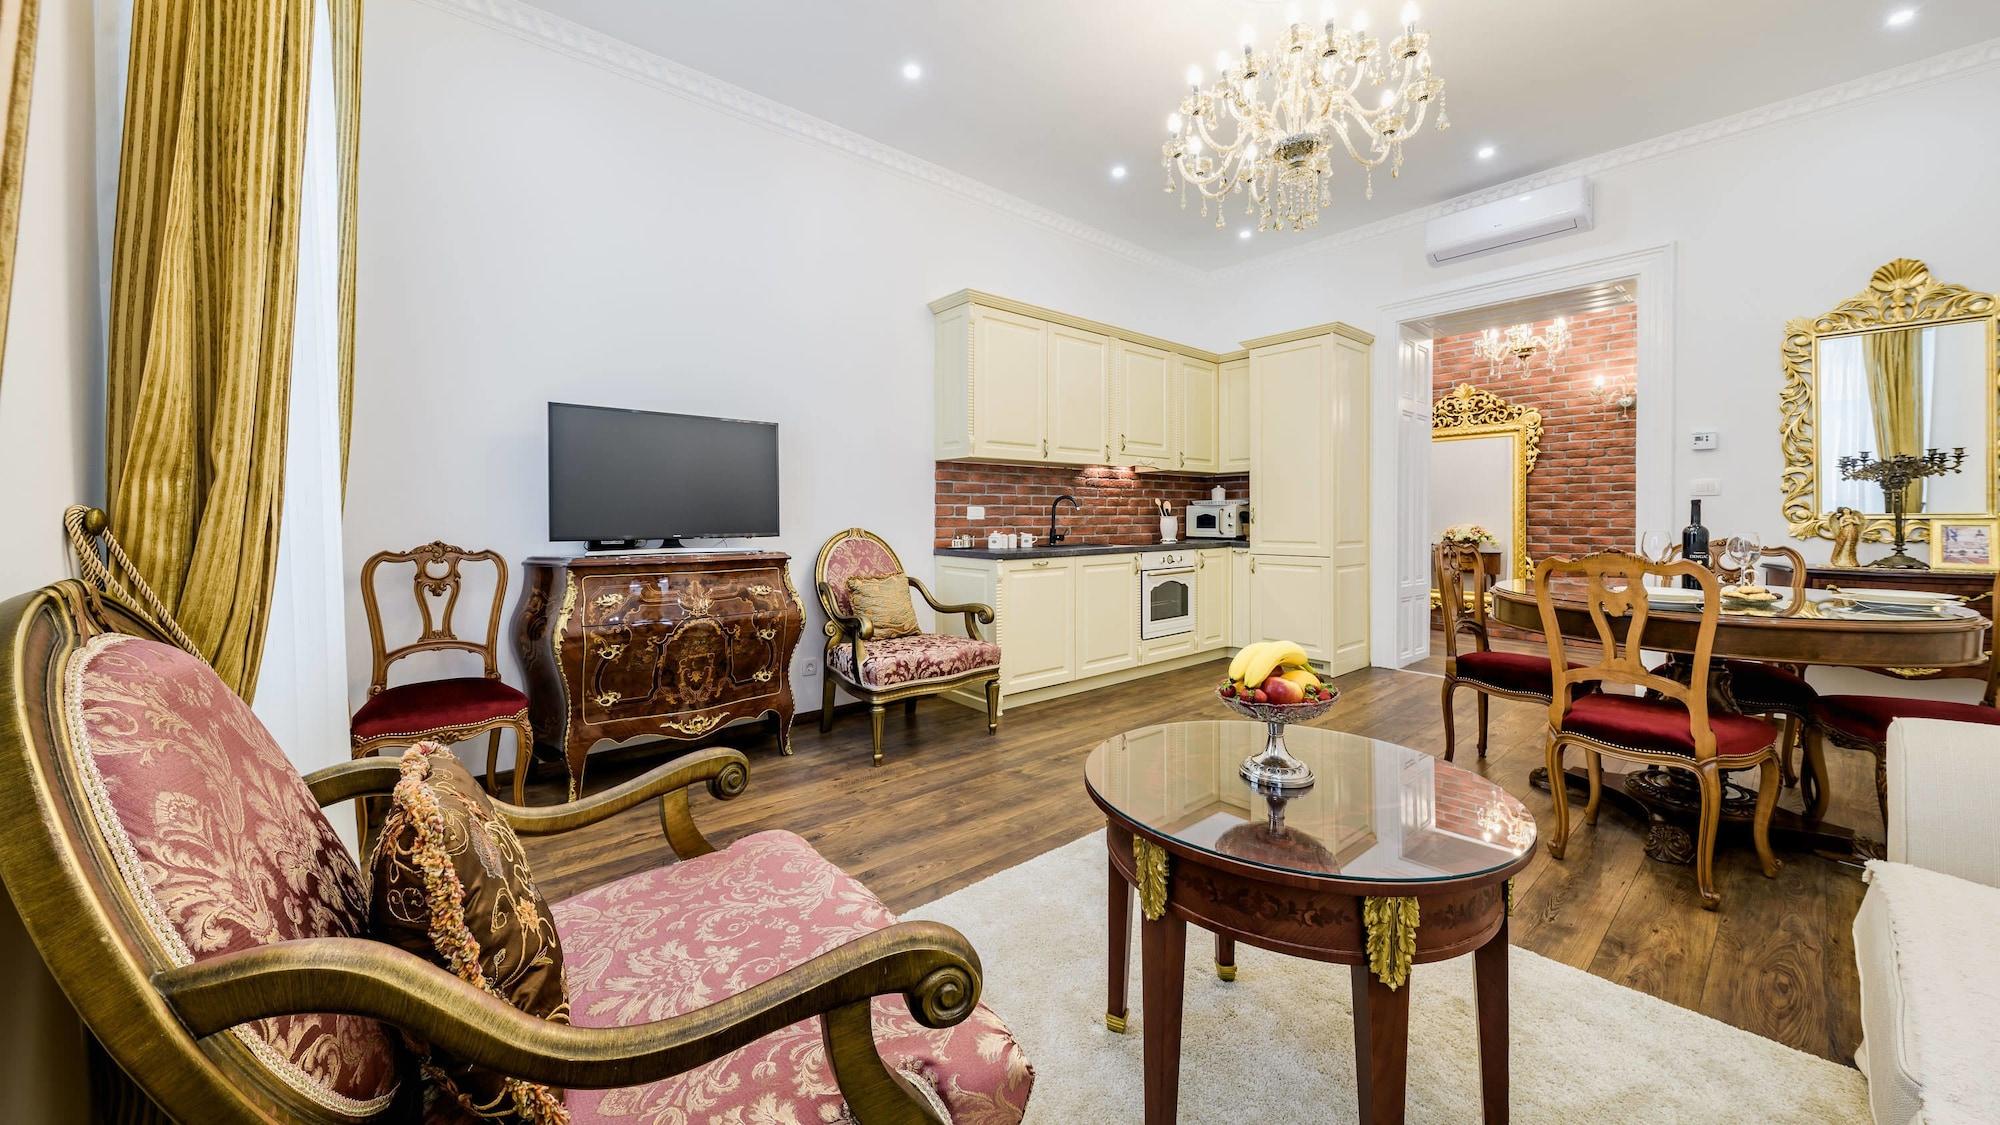 Royal Apartment Zagreb, Zagreb